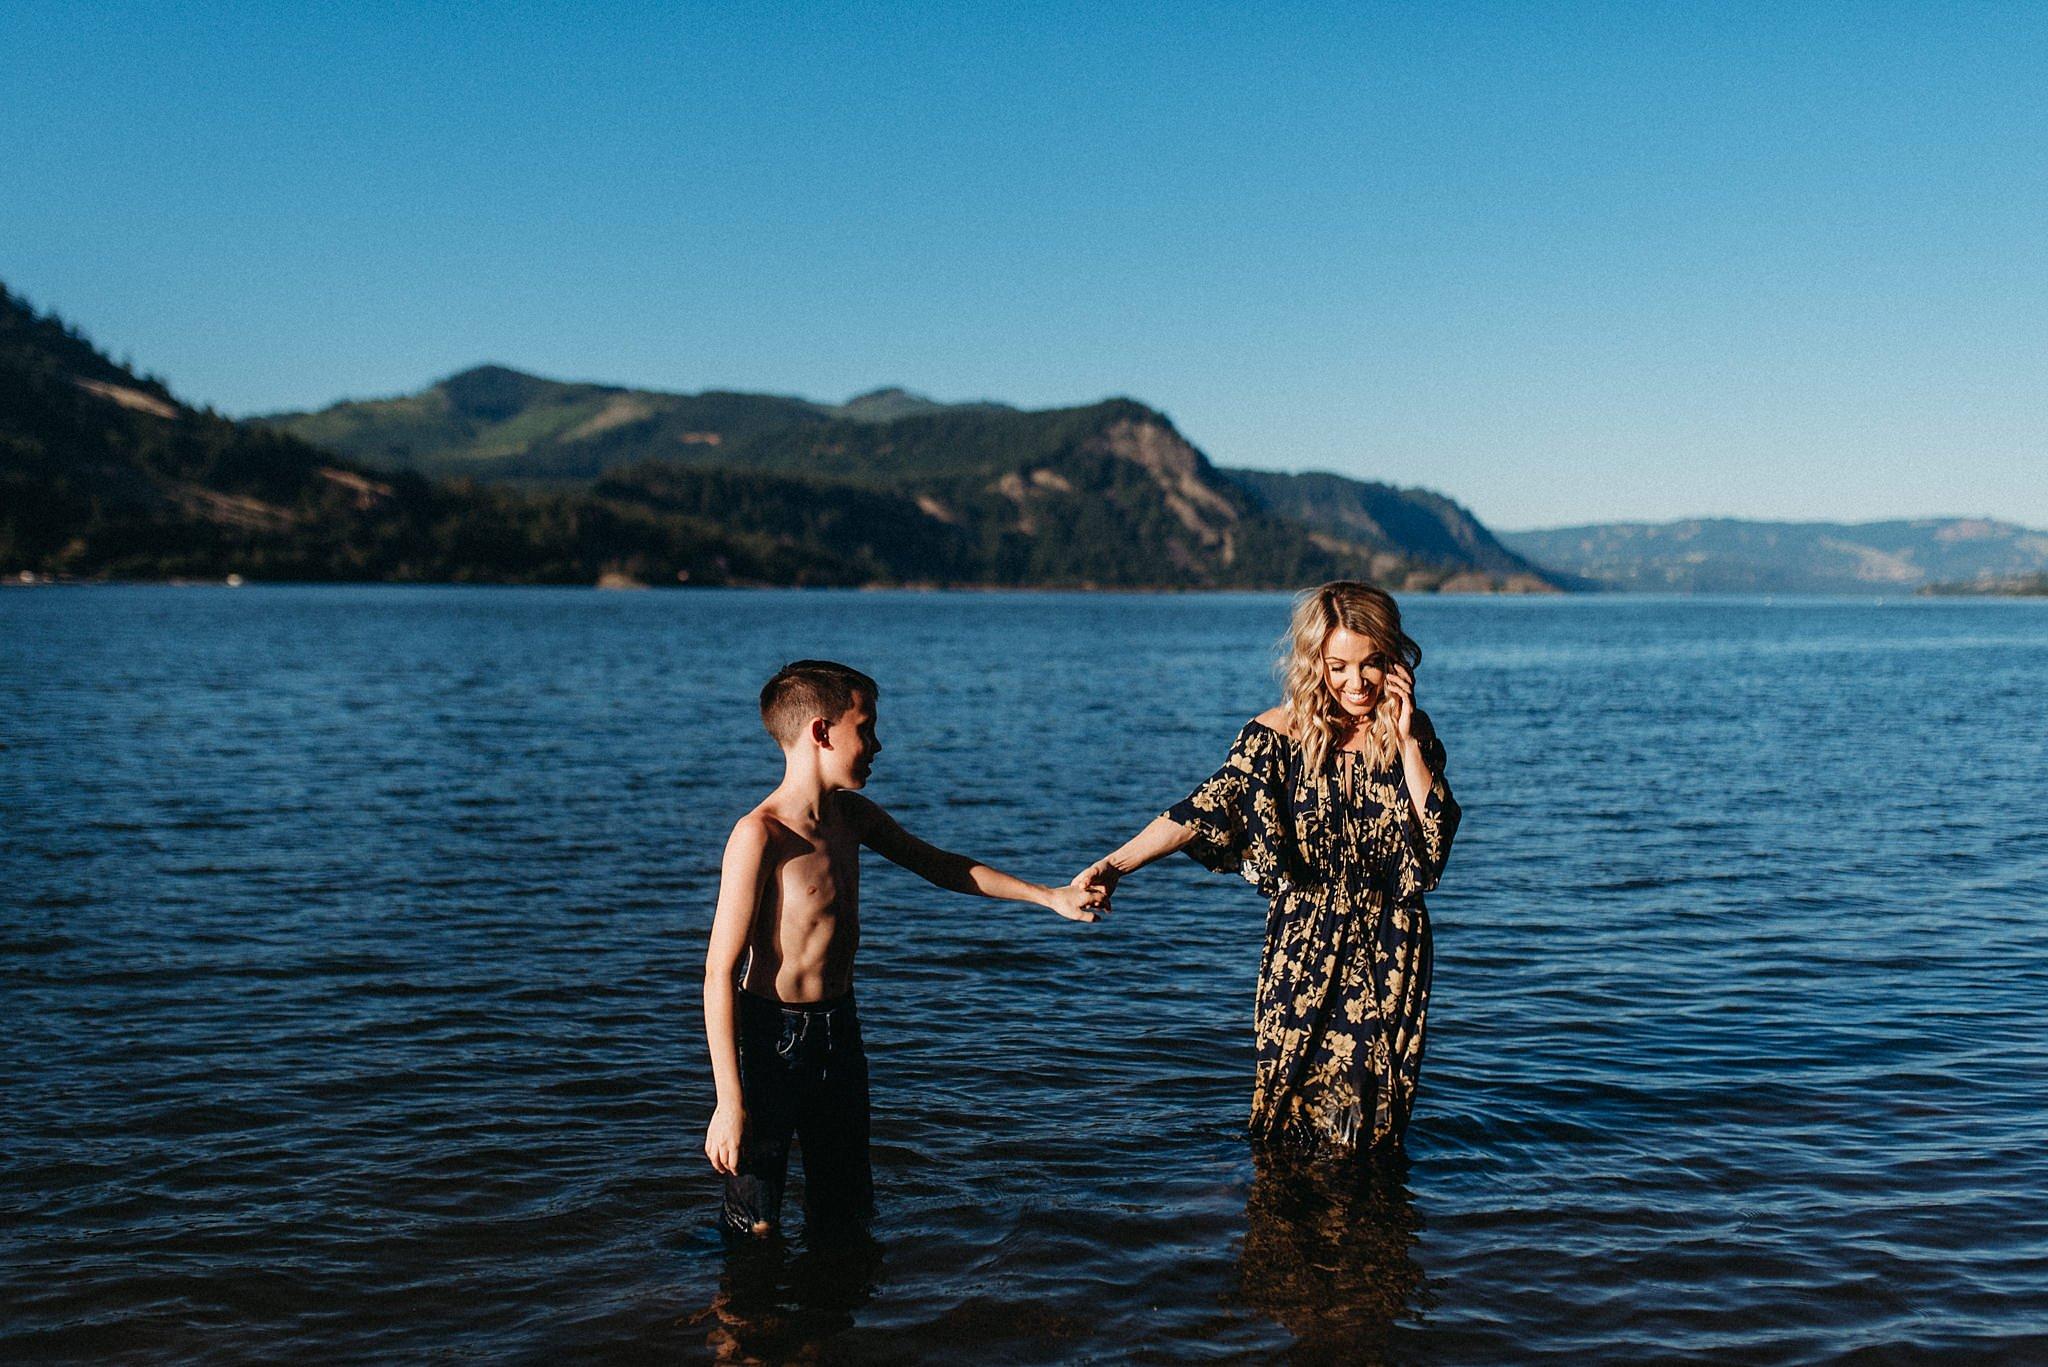 twyla jones photography - treasure coast florida - intimate couples session urban cowboy b&b | brooklyn New York_0071.jpg